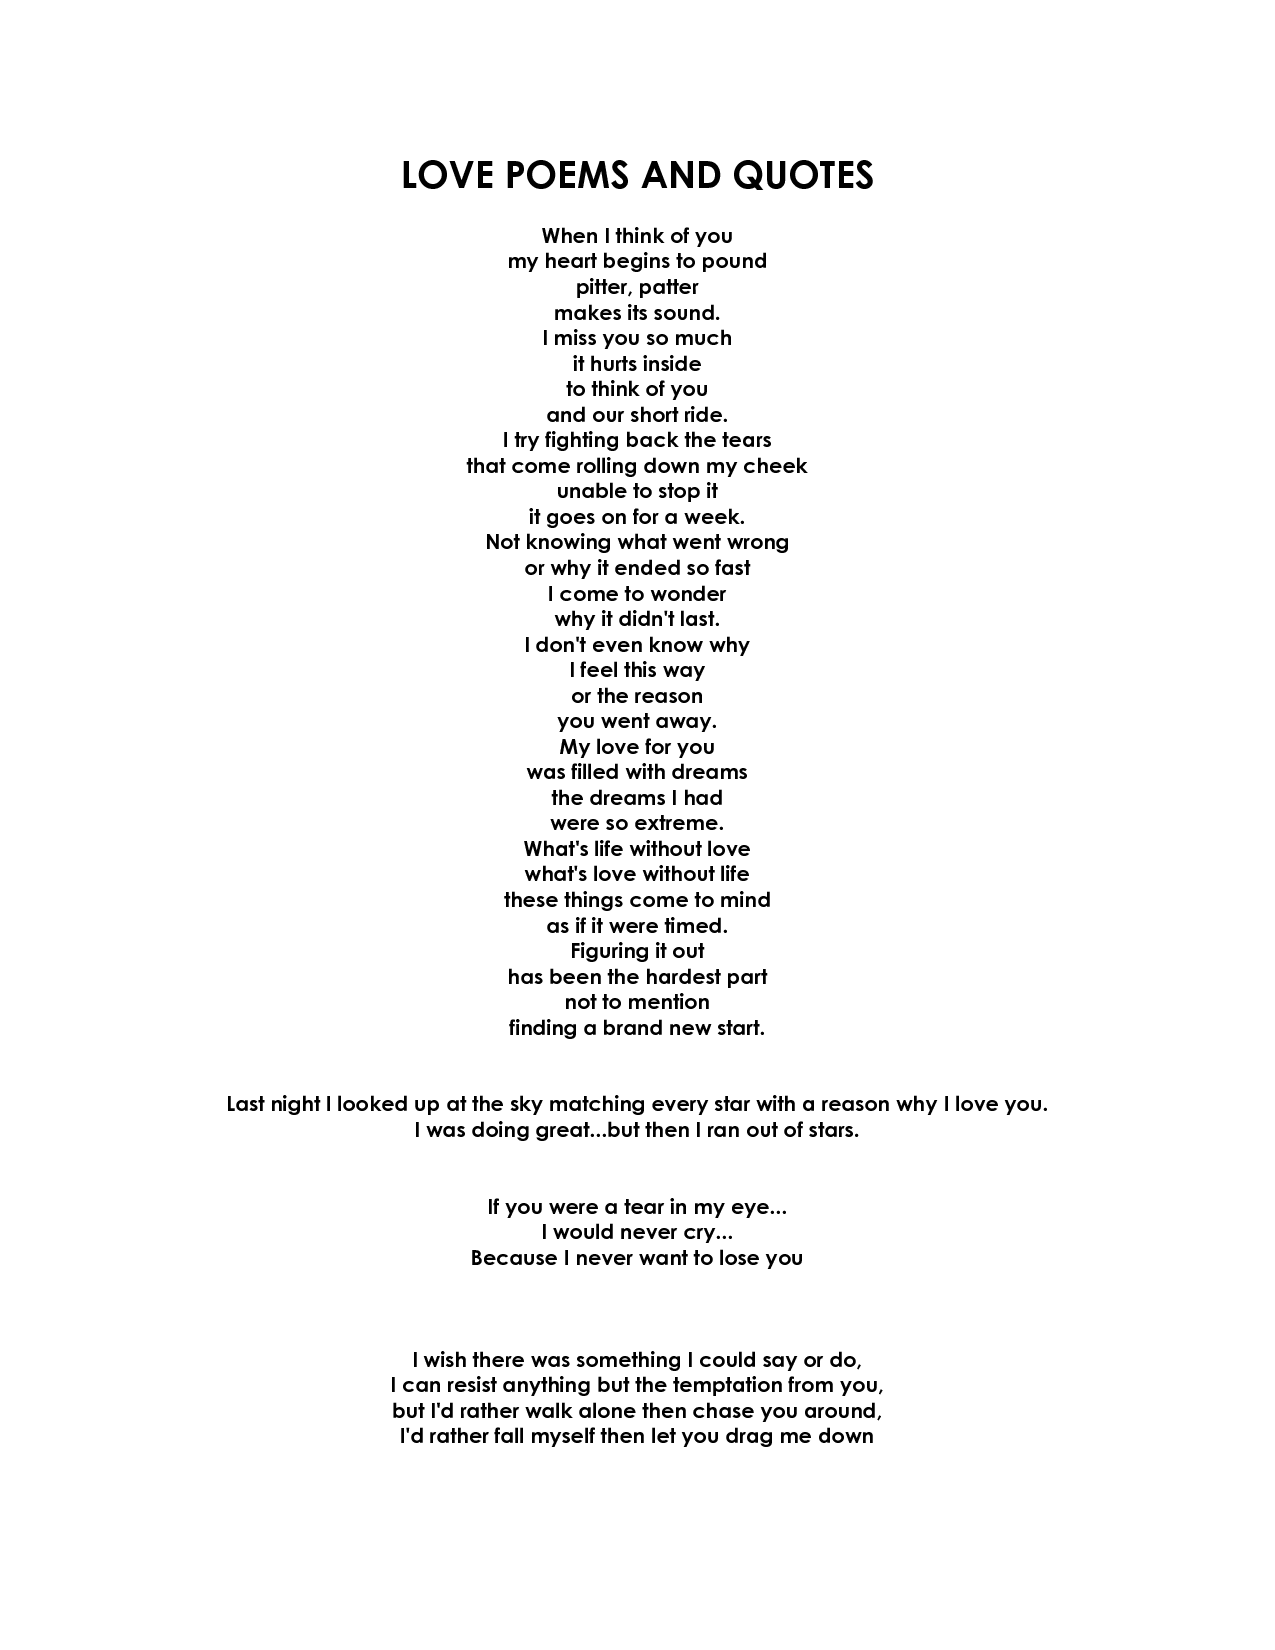 Sad goodbye love poems document sample projects to try sad goodbye love poems document sample thecheapjerseys Images